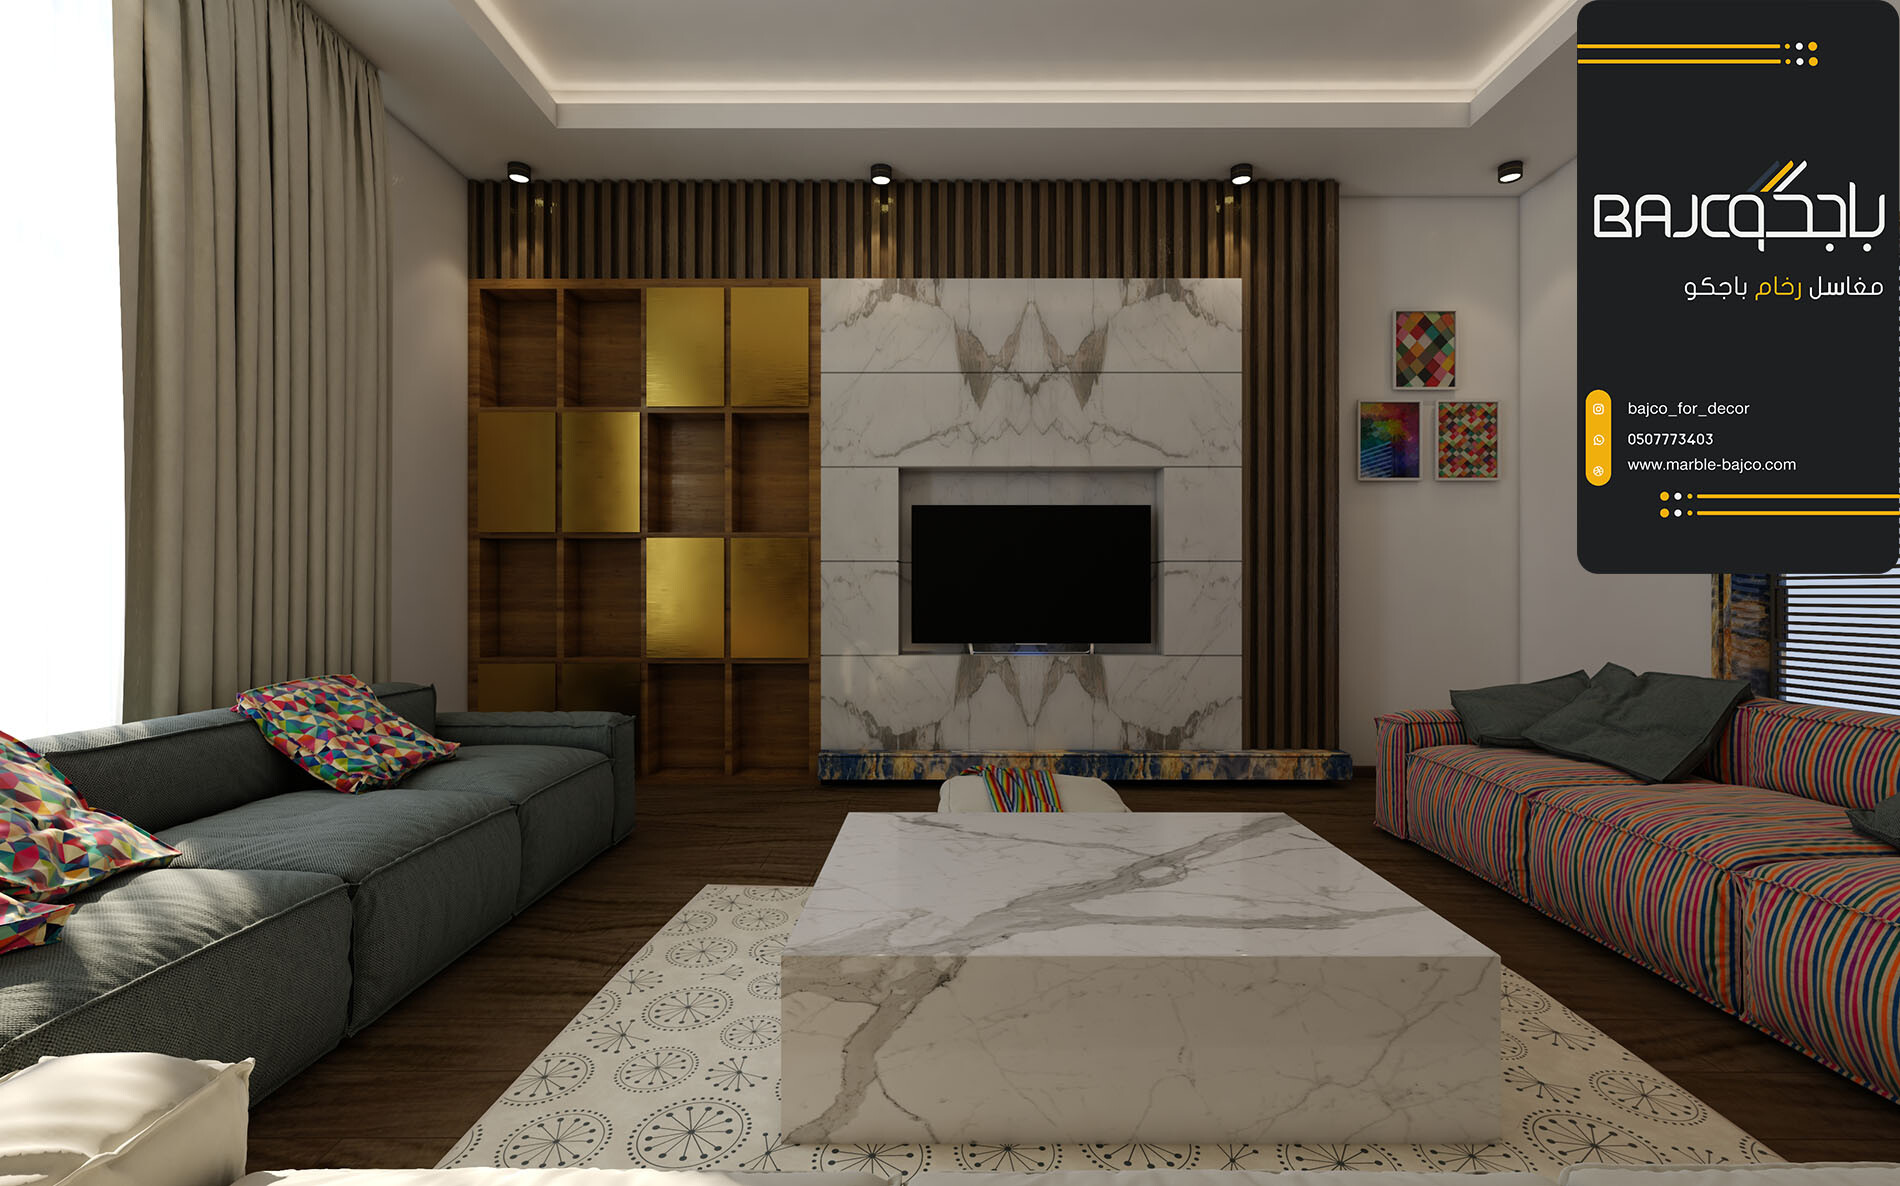 تصميم living room (11)